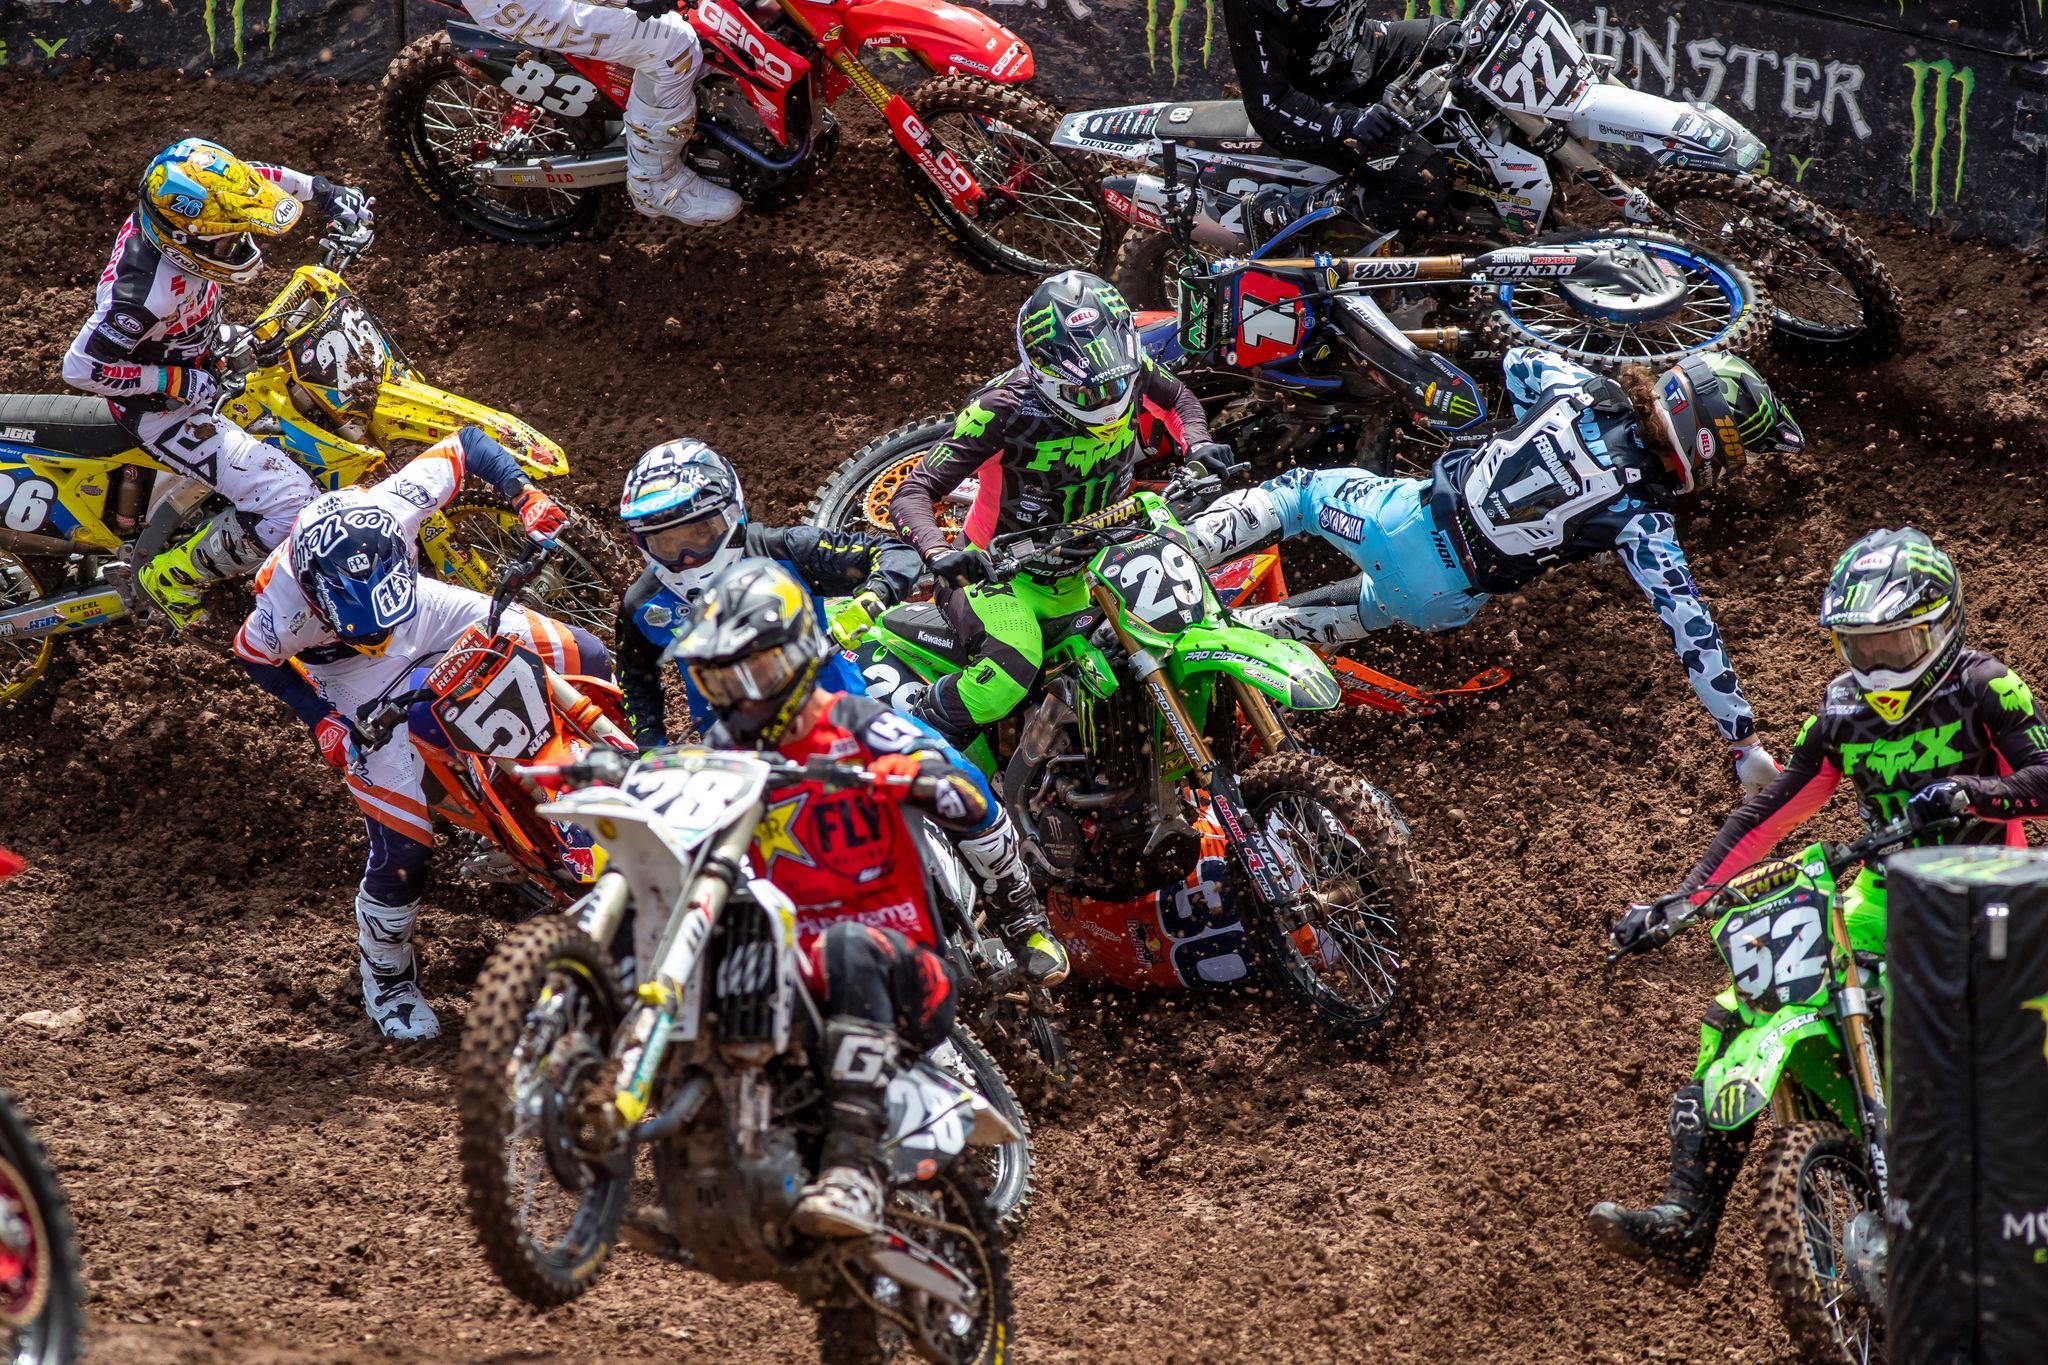 Supercross riders cornering crash pile up action